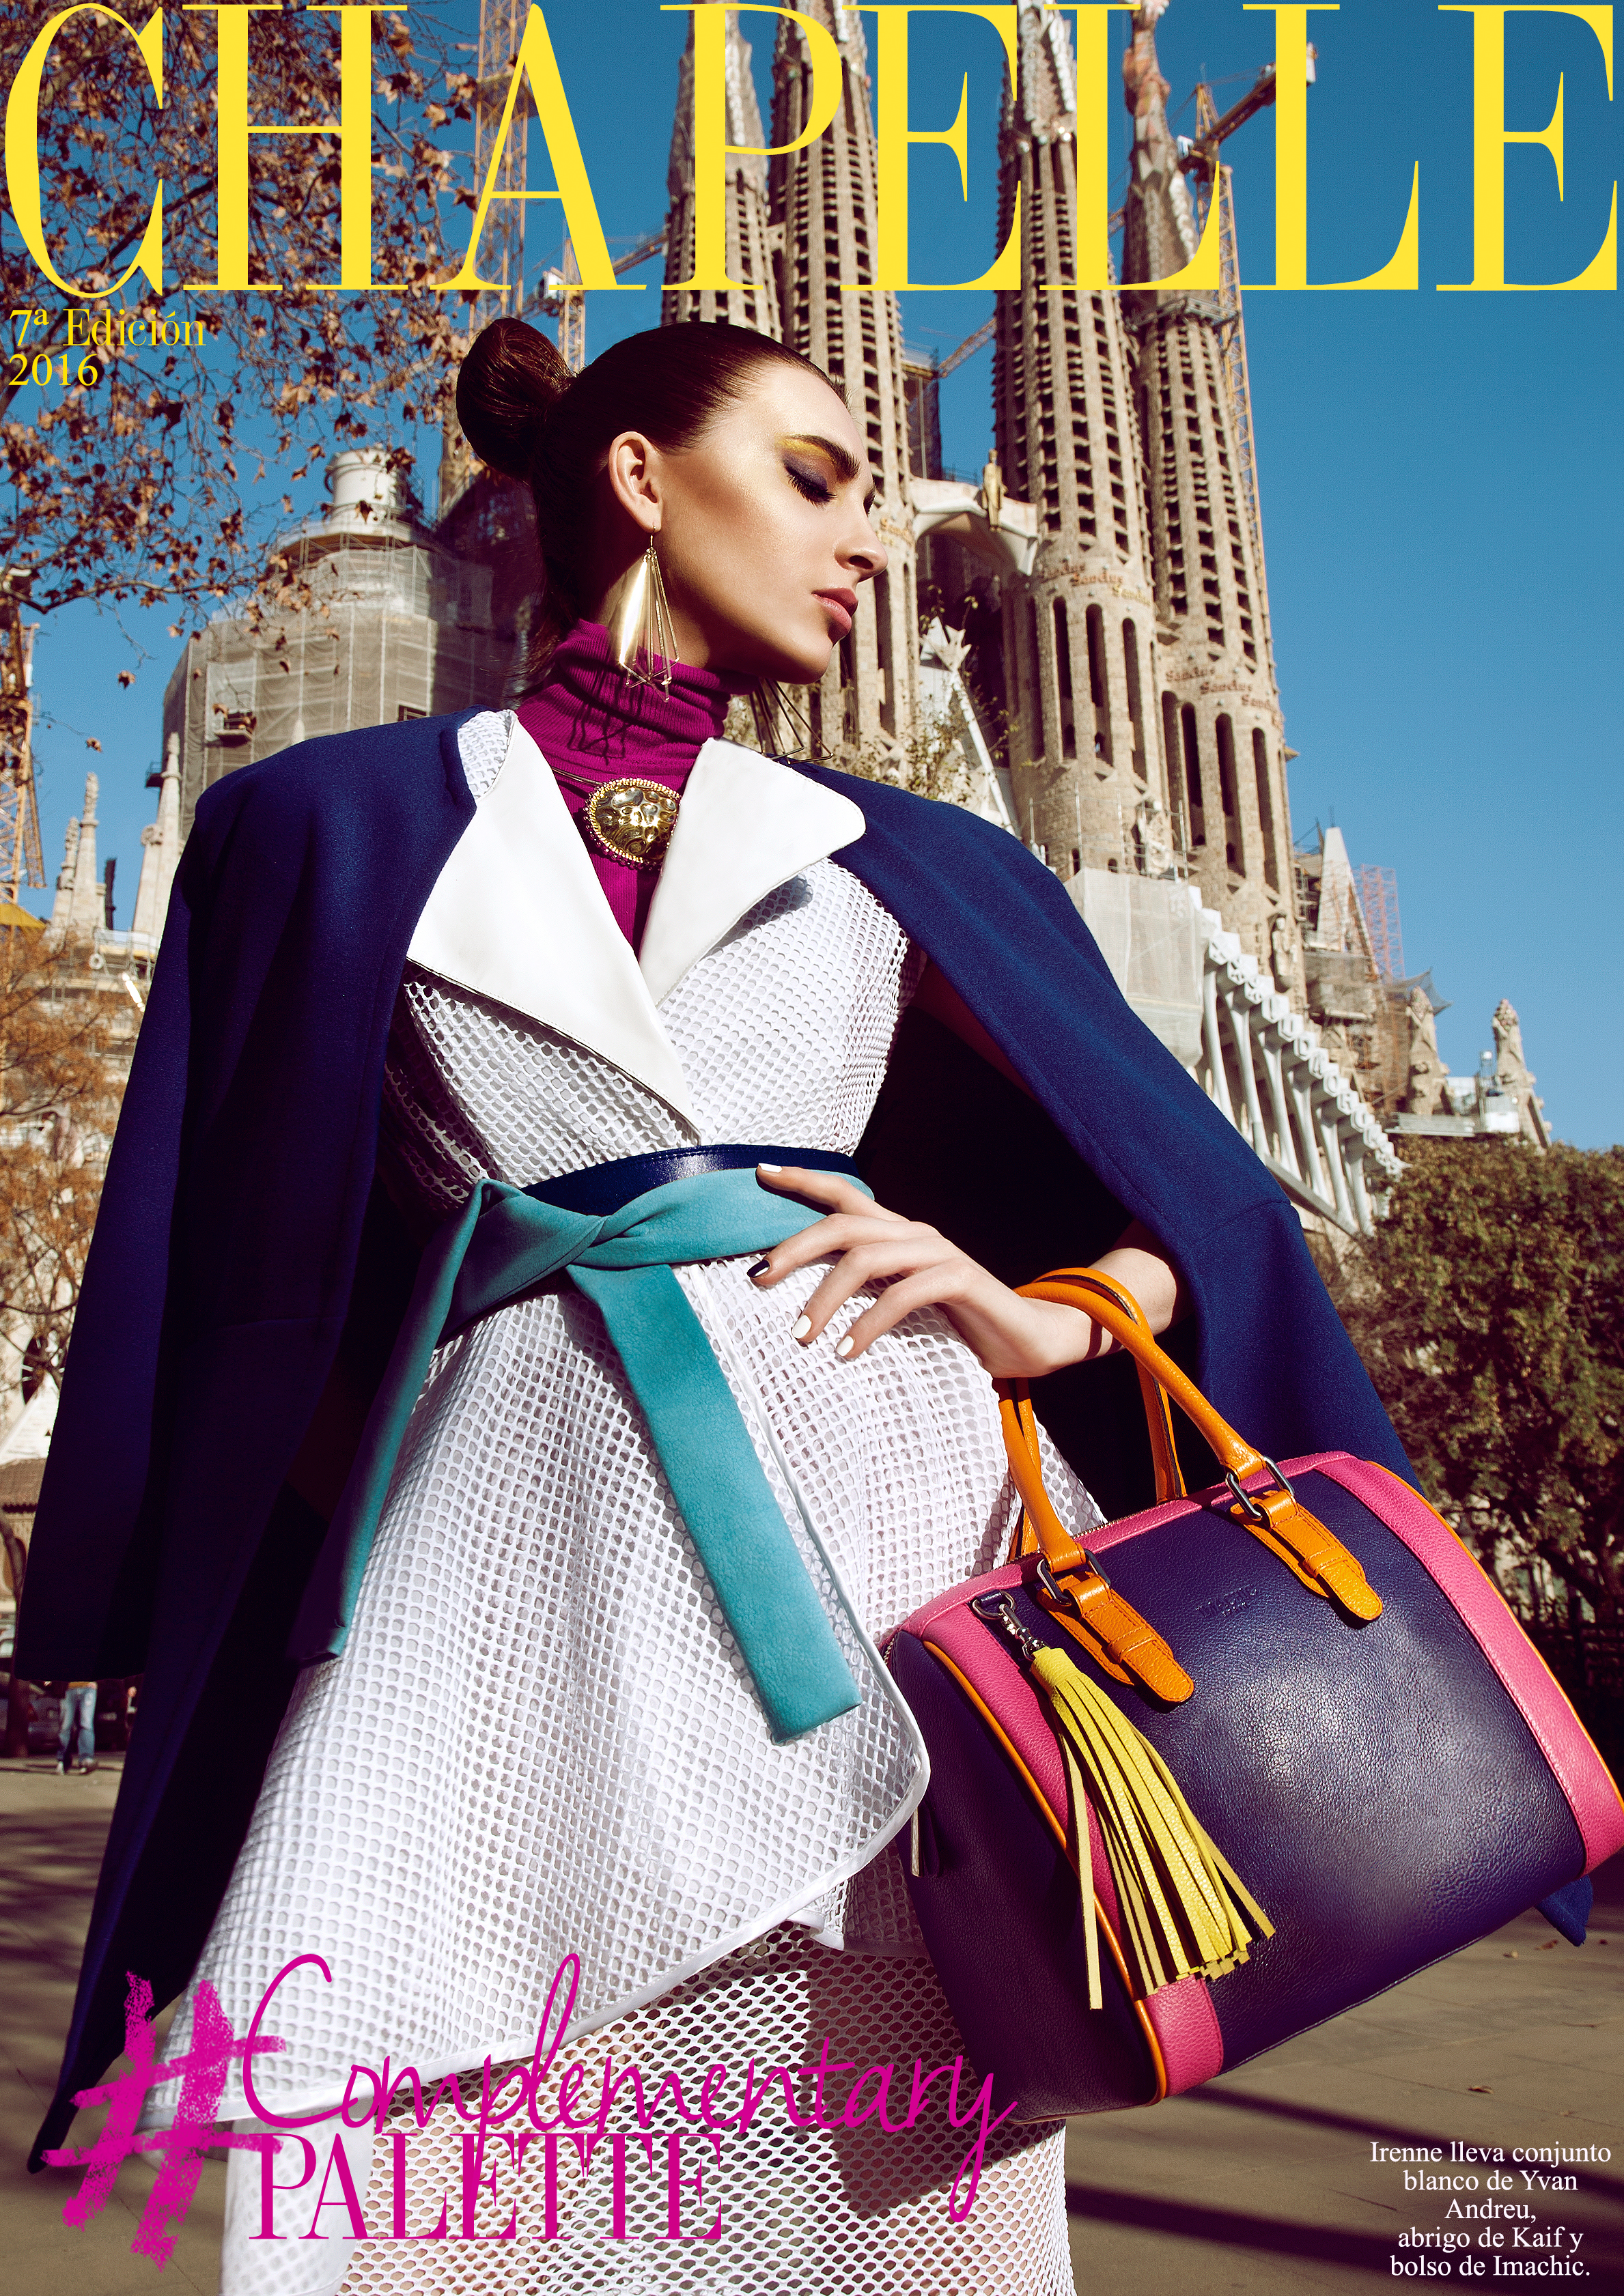 chapelle magazine, fashion issue, febrero-marzo, revista diseño valencia españa, valencia, diseño emergente independiente, revista moda,